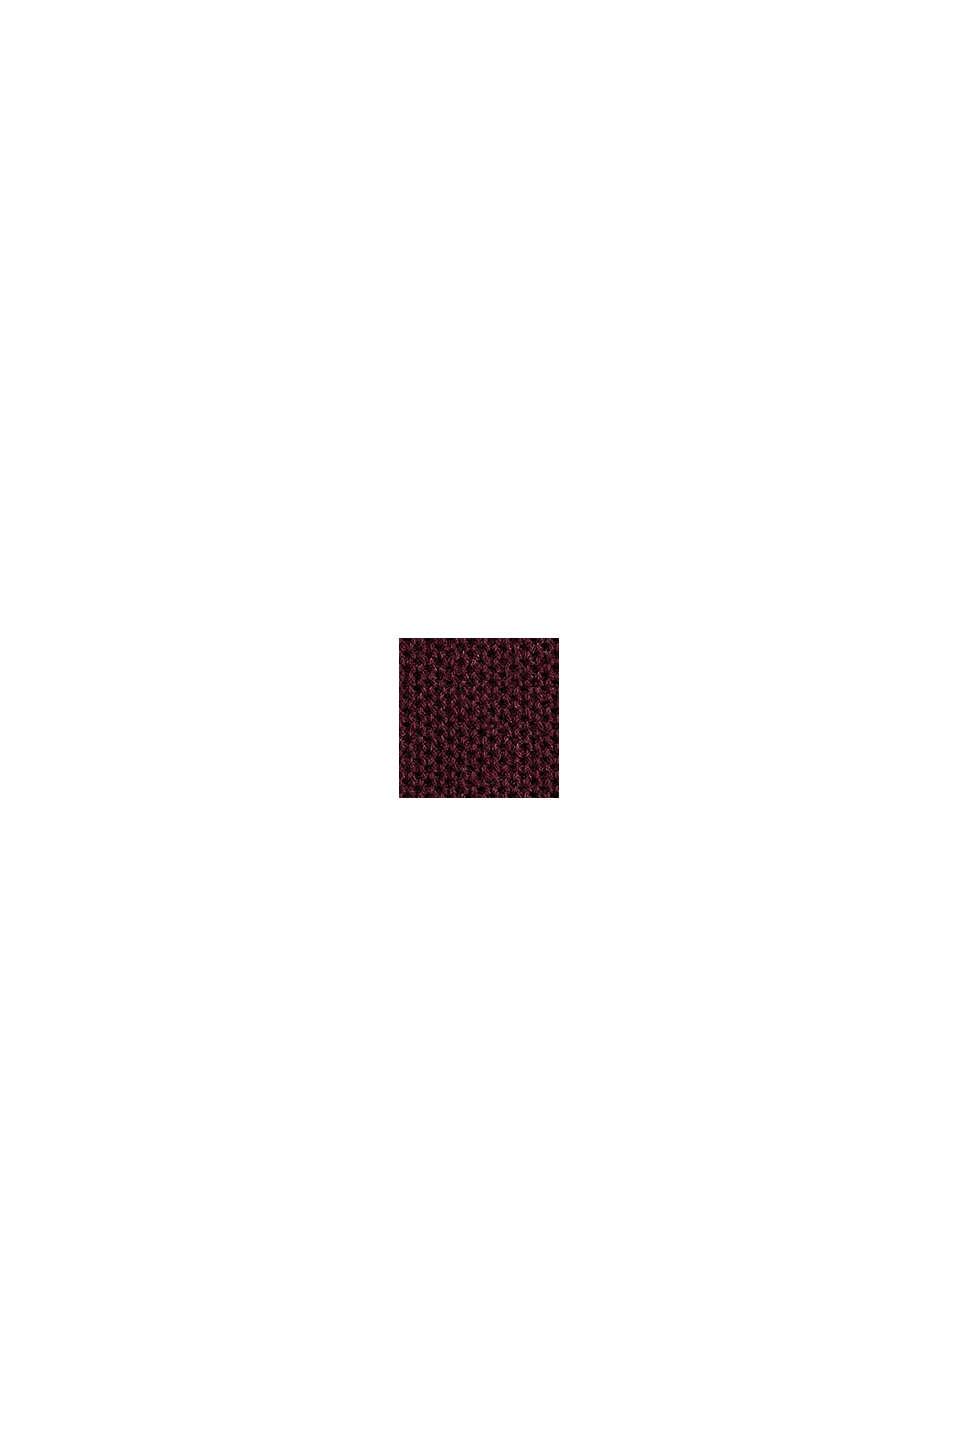 Pull-over en maille piquée, 100% coton, BORDEAUX RED, swatch